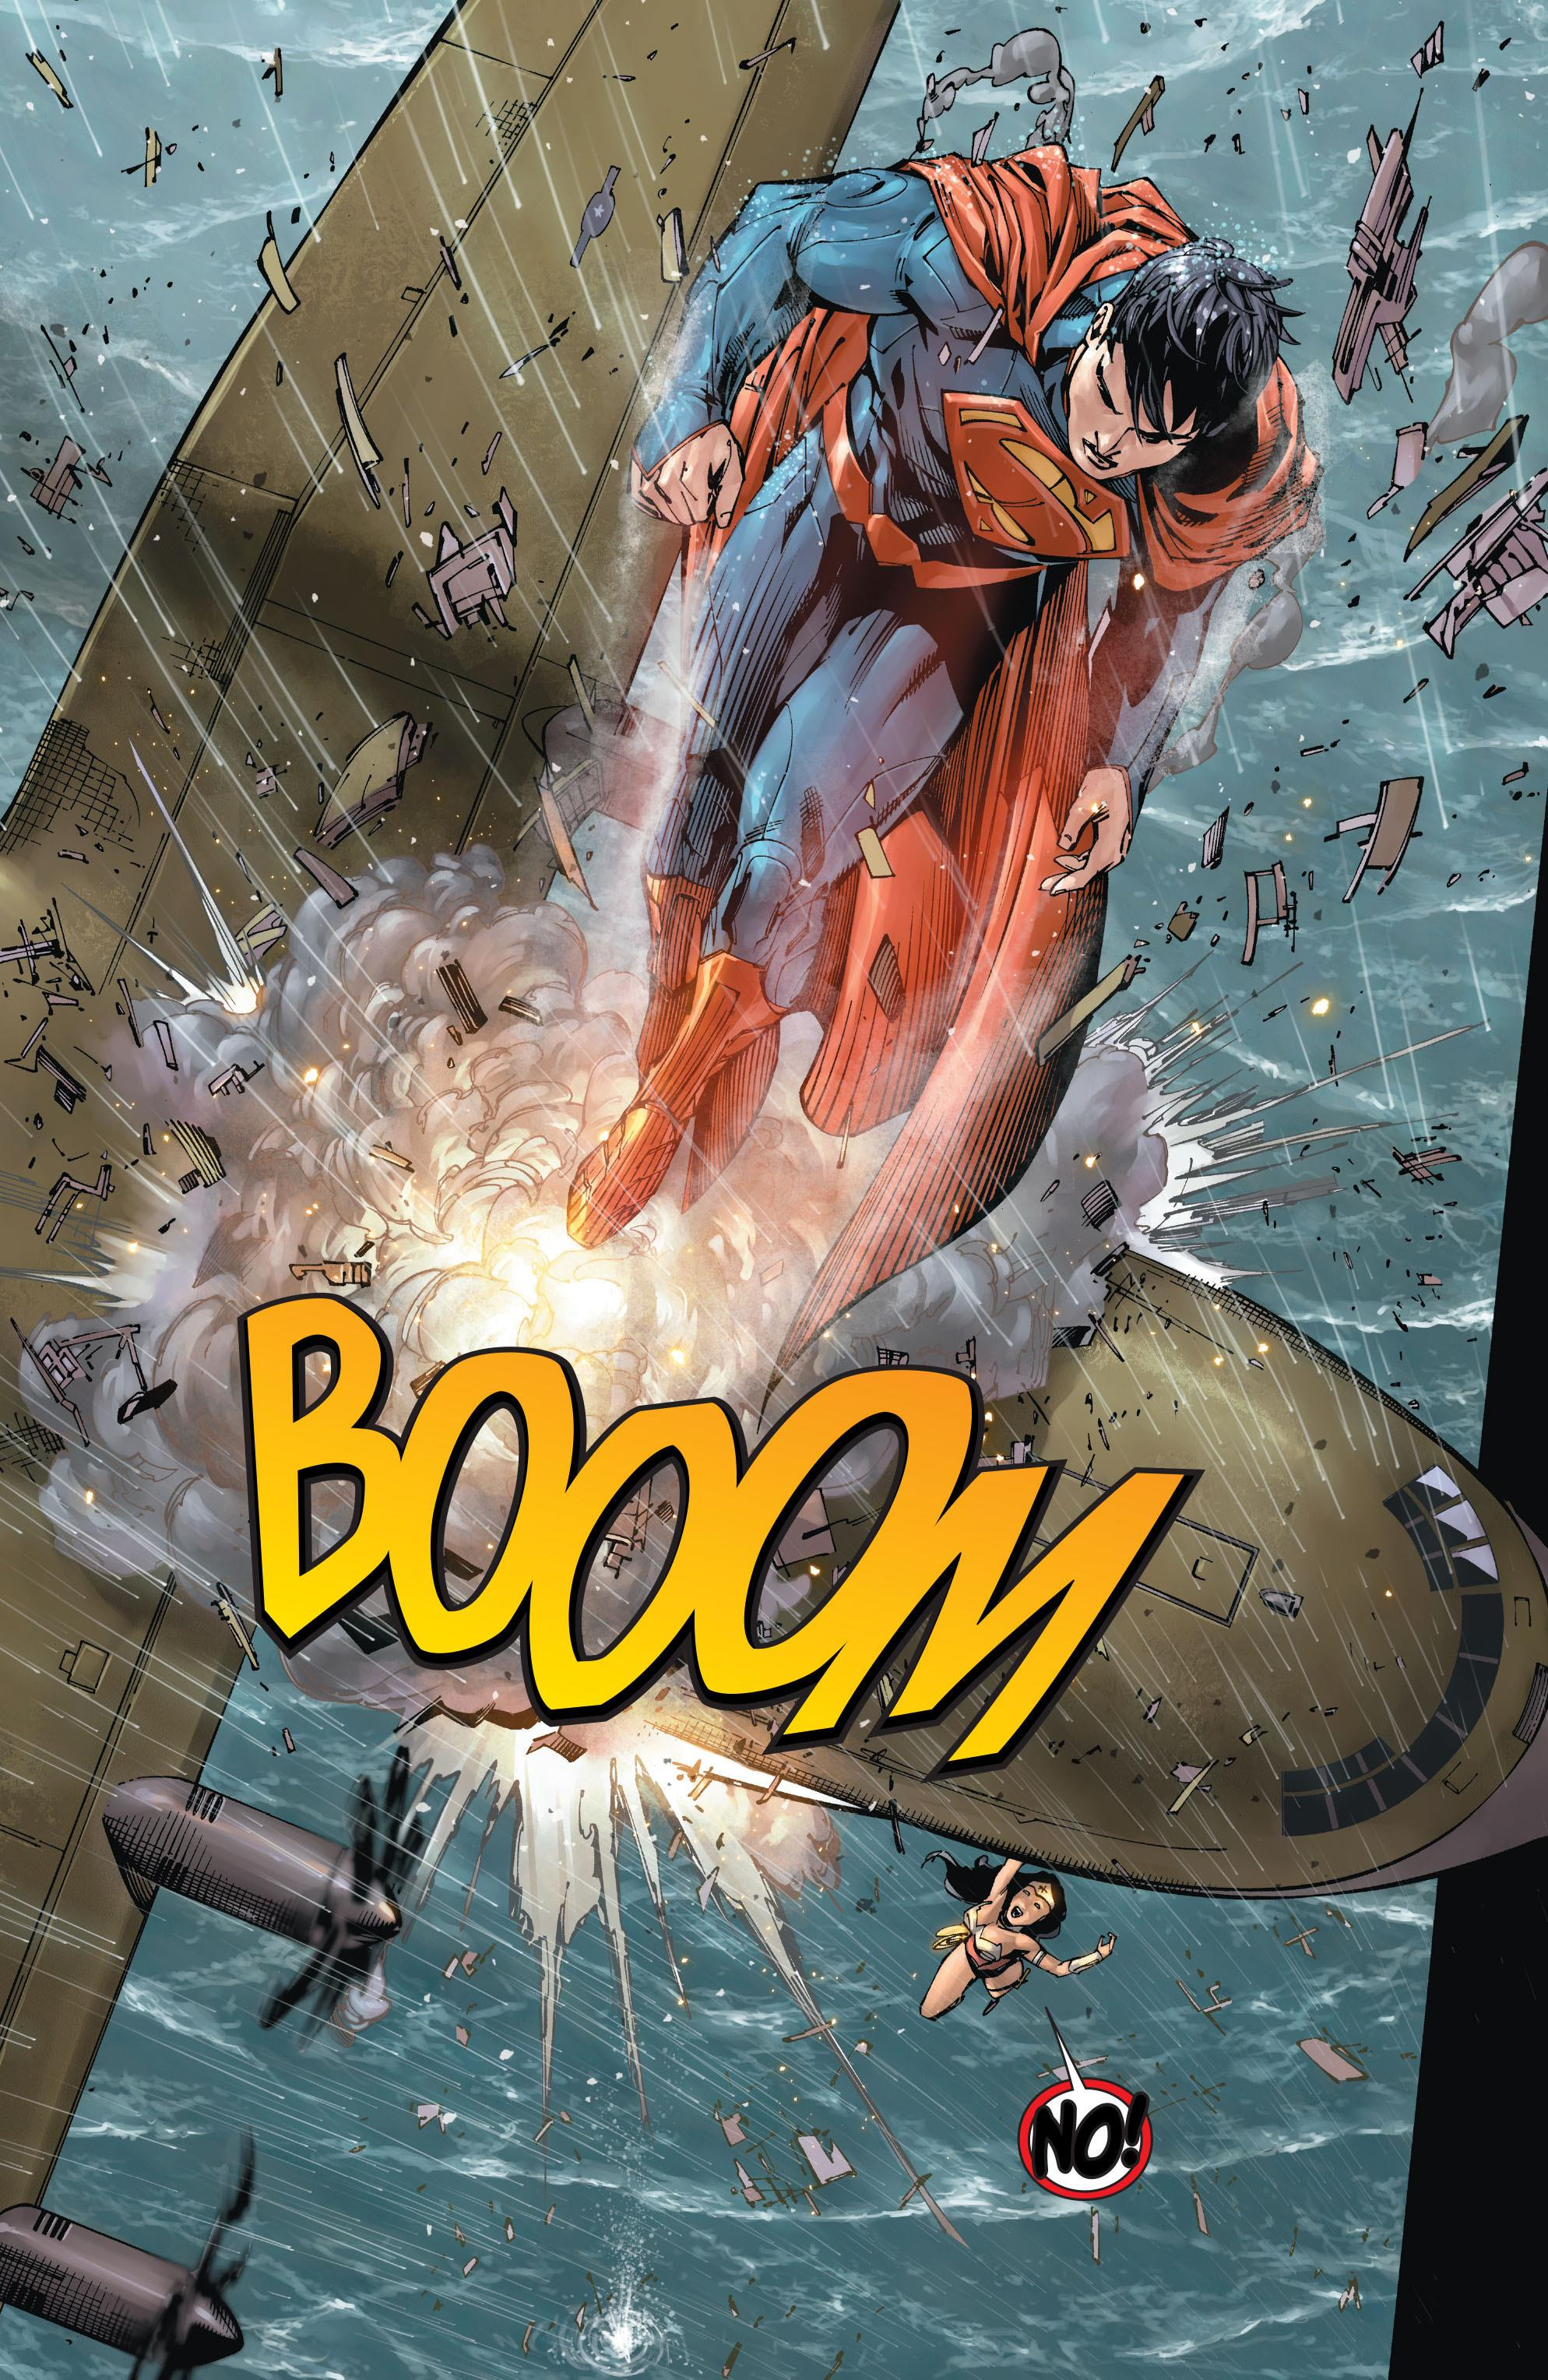 Superman-Wonder Woman Power Couple review